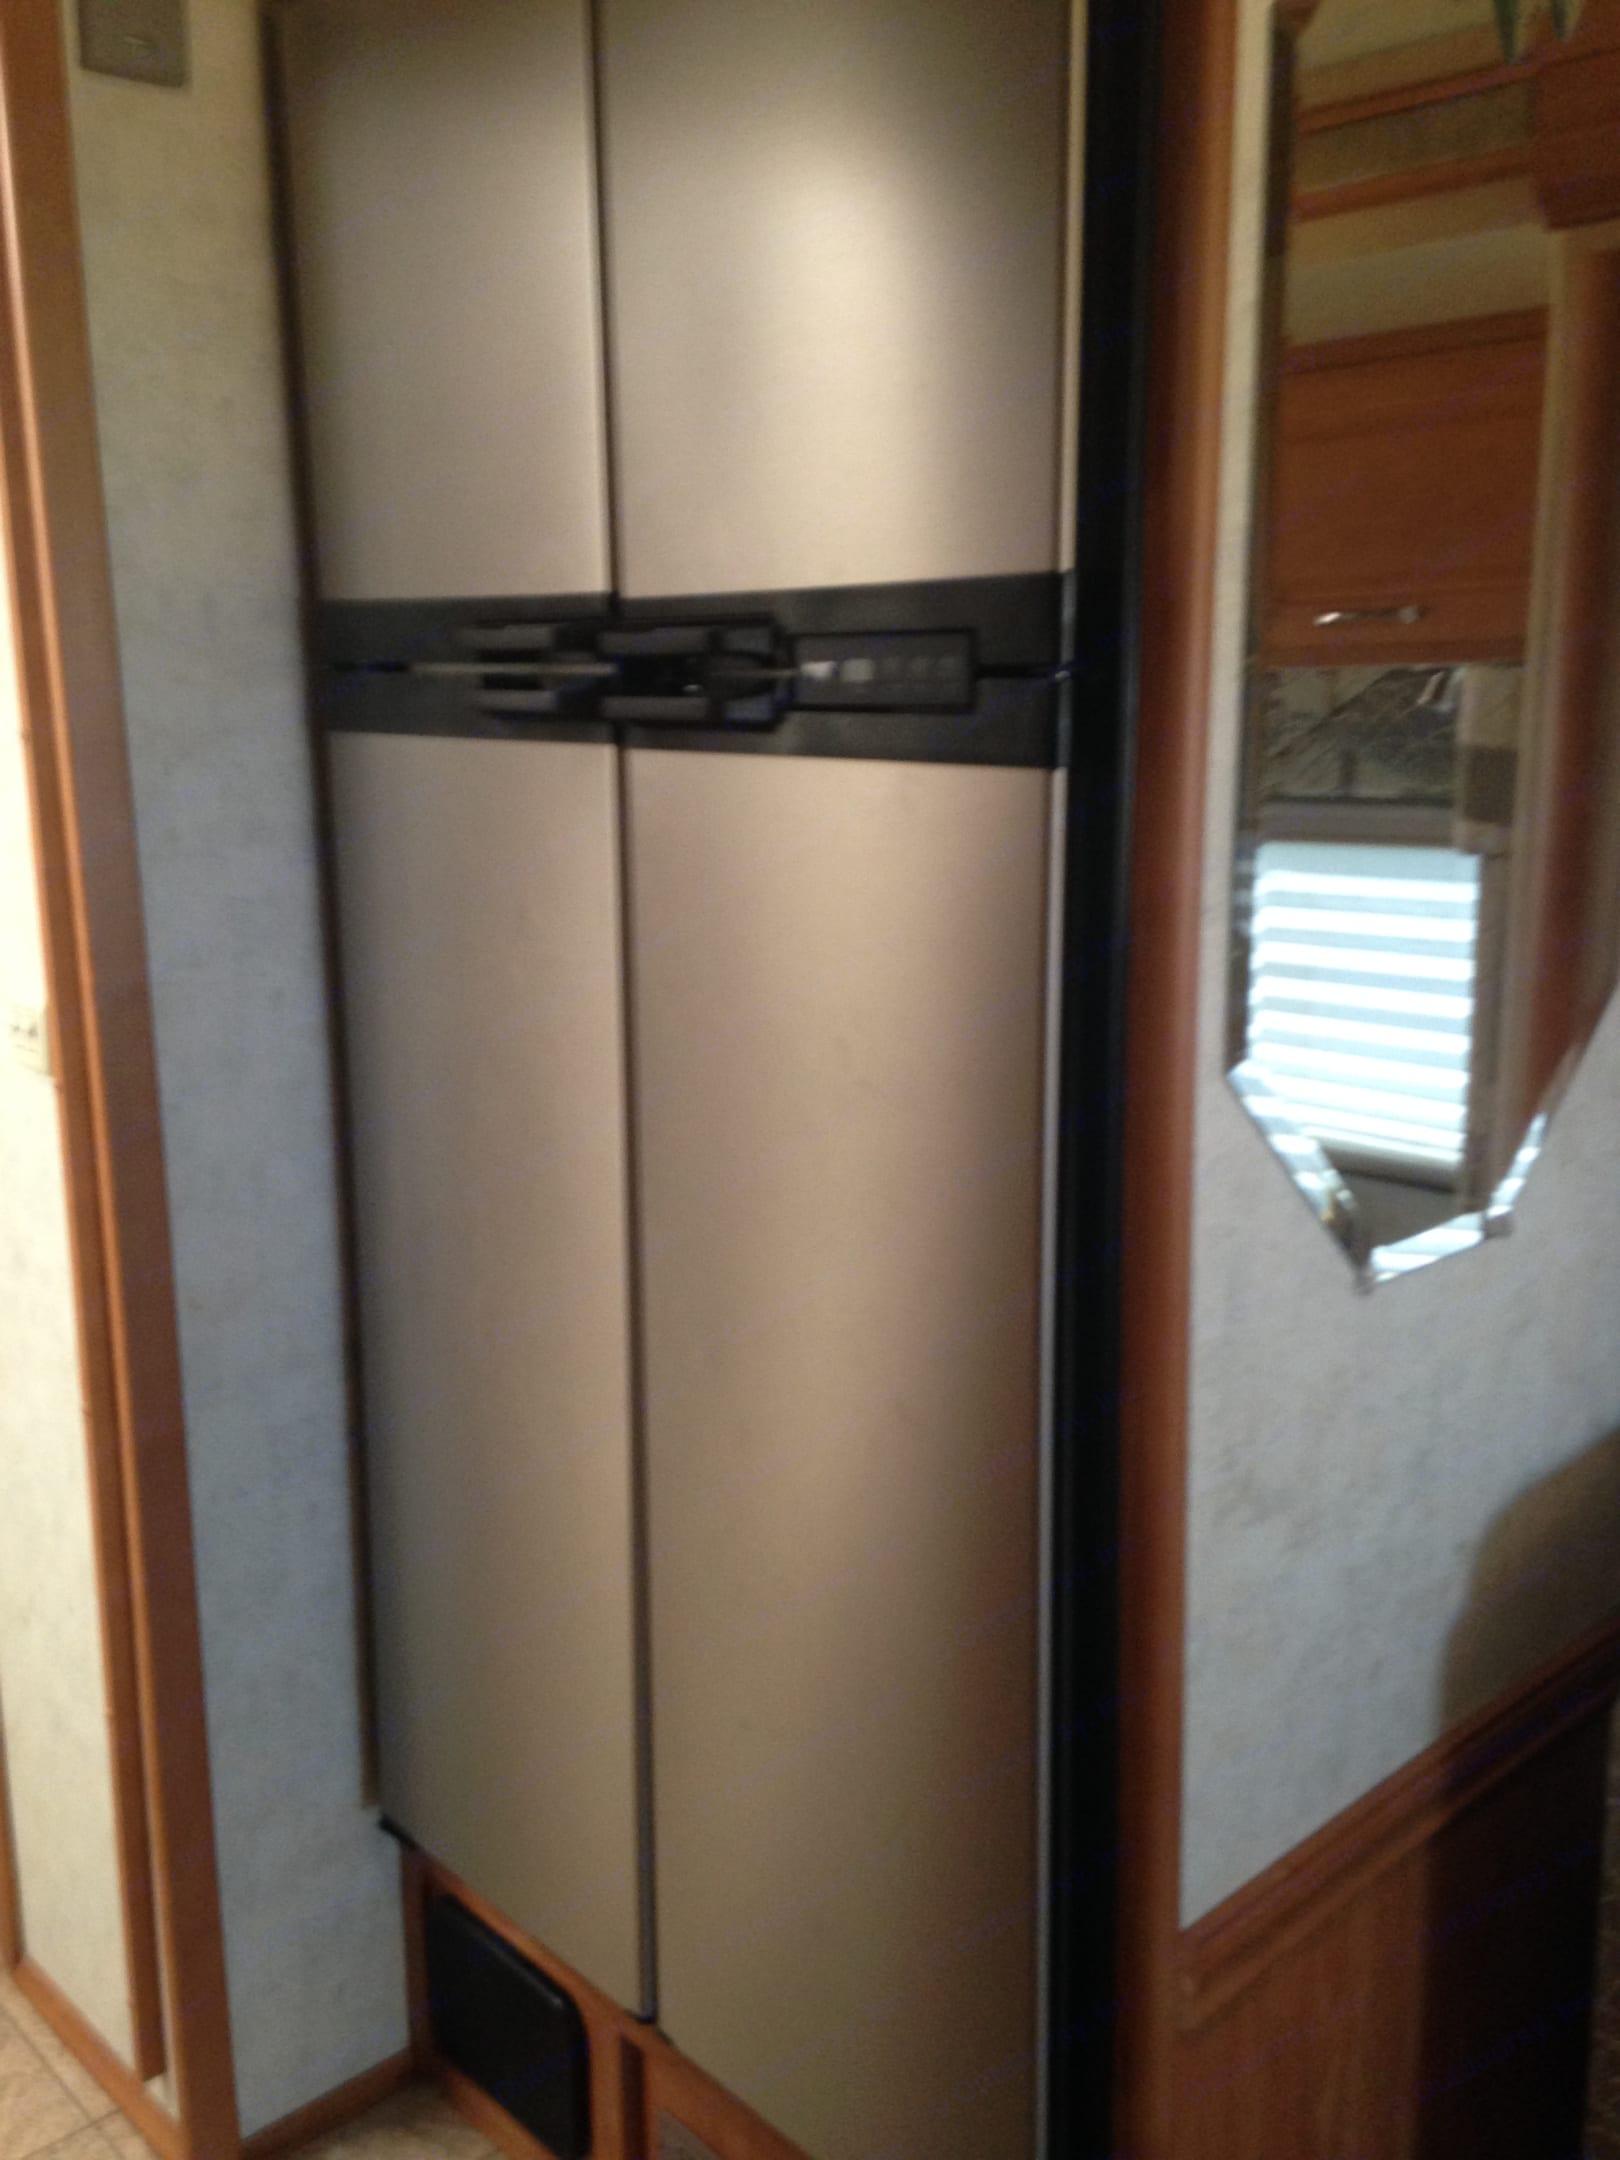 Refrigerator. Winnebago Journey 2005